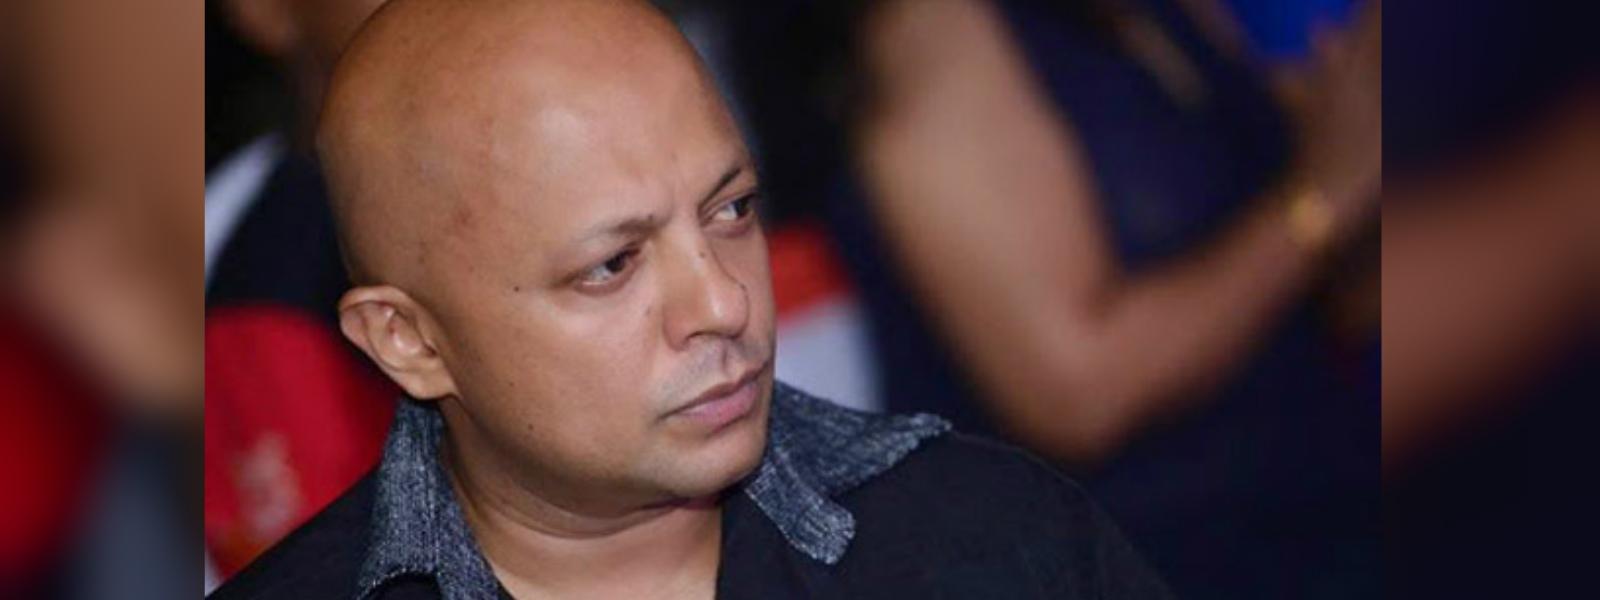 Madumadawa Aravinda resigns from his position at Pivithuru Hela Urumaya